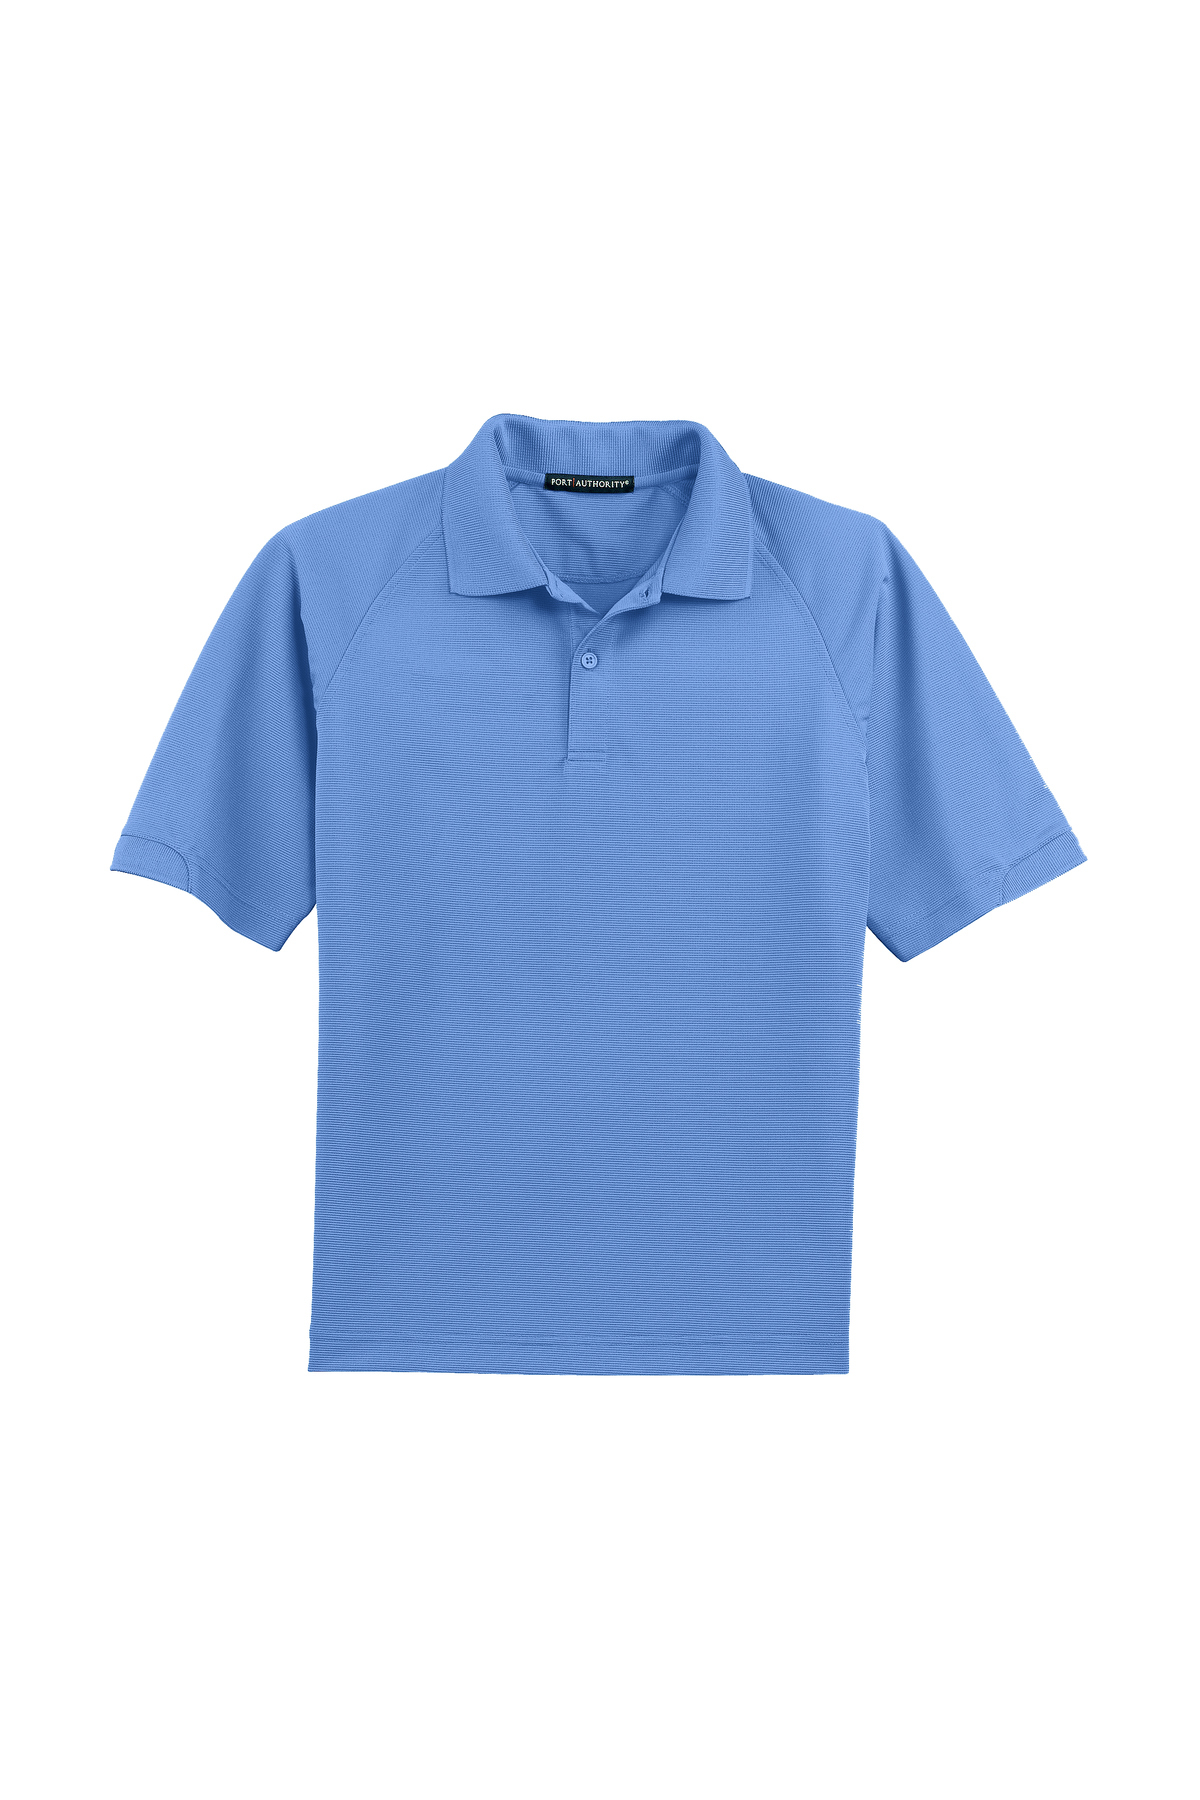 Port Authority Dry Zone Ottoman Sport Shirts